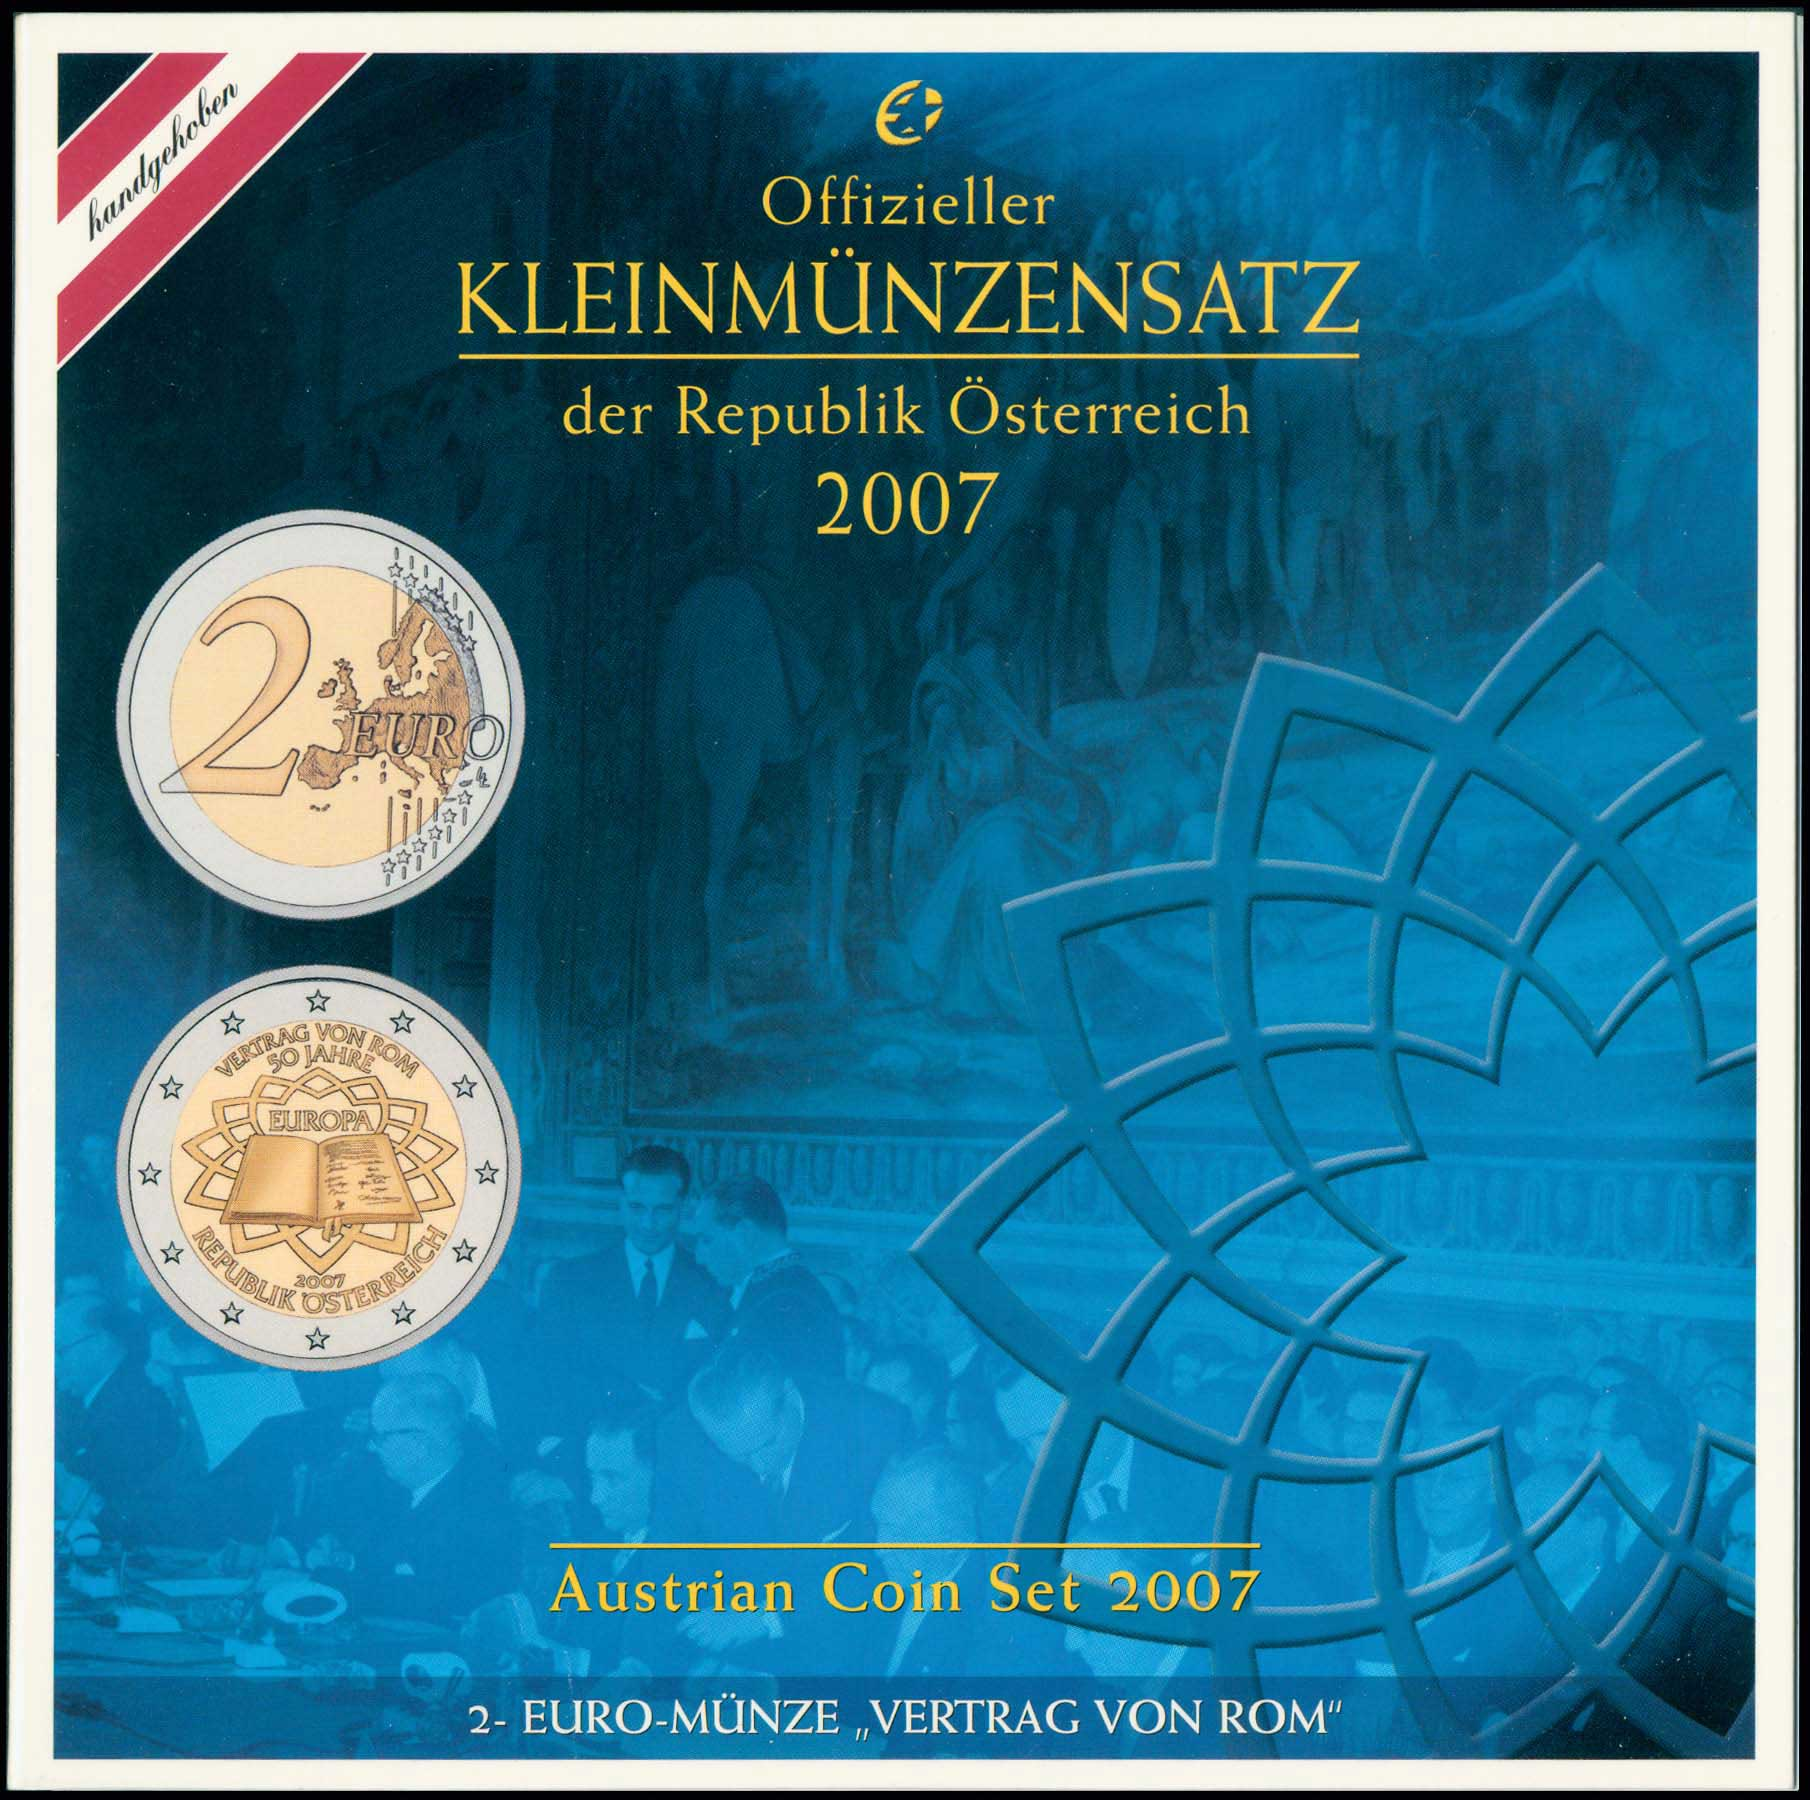 Lot 6792 - -  COINS & TOKENS COINS & TOKENS OF EUROPEAN COUNTRIES -  A. Karamitsos Postal & Live Internet Auction 984 (Part B)